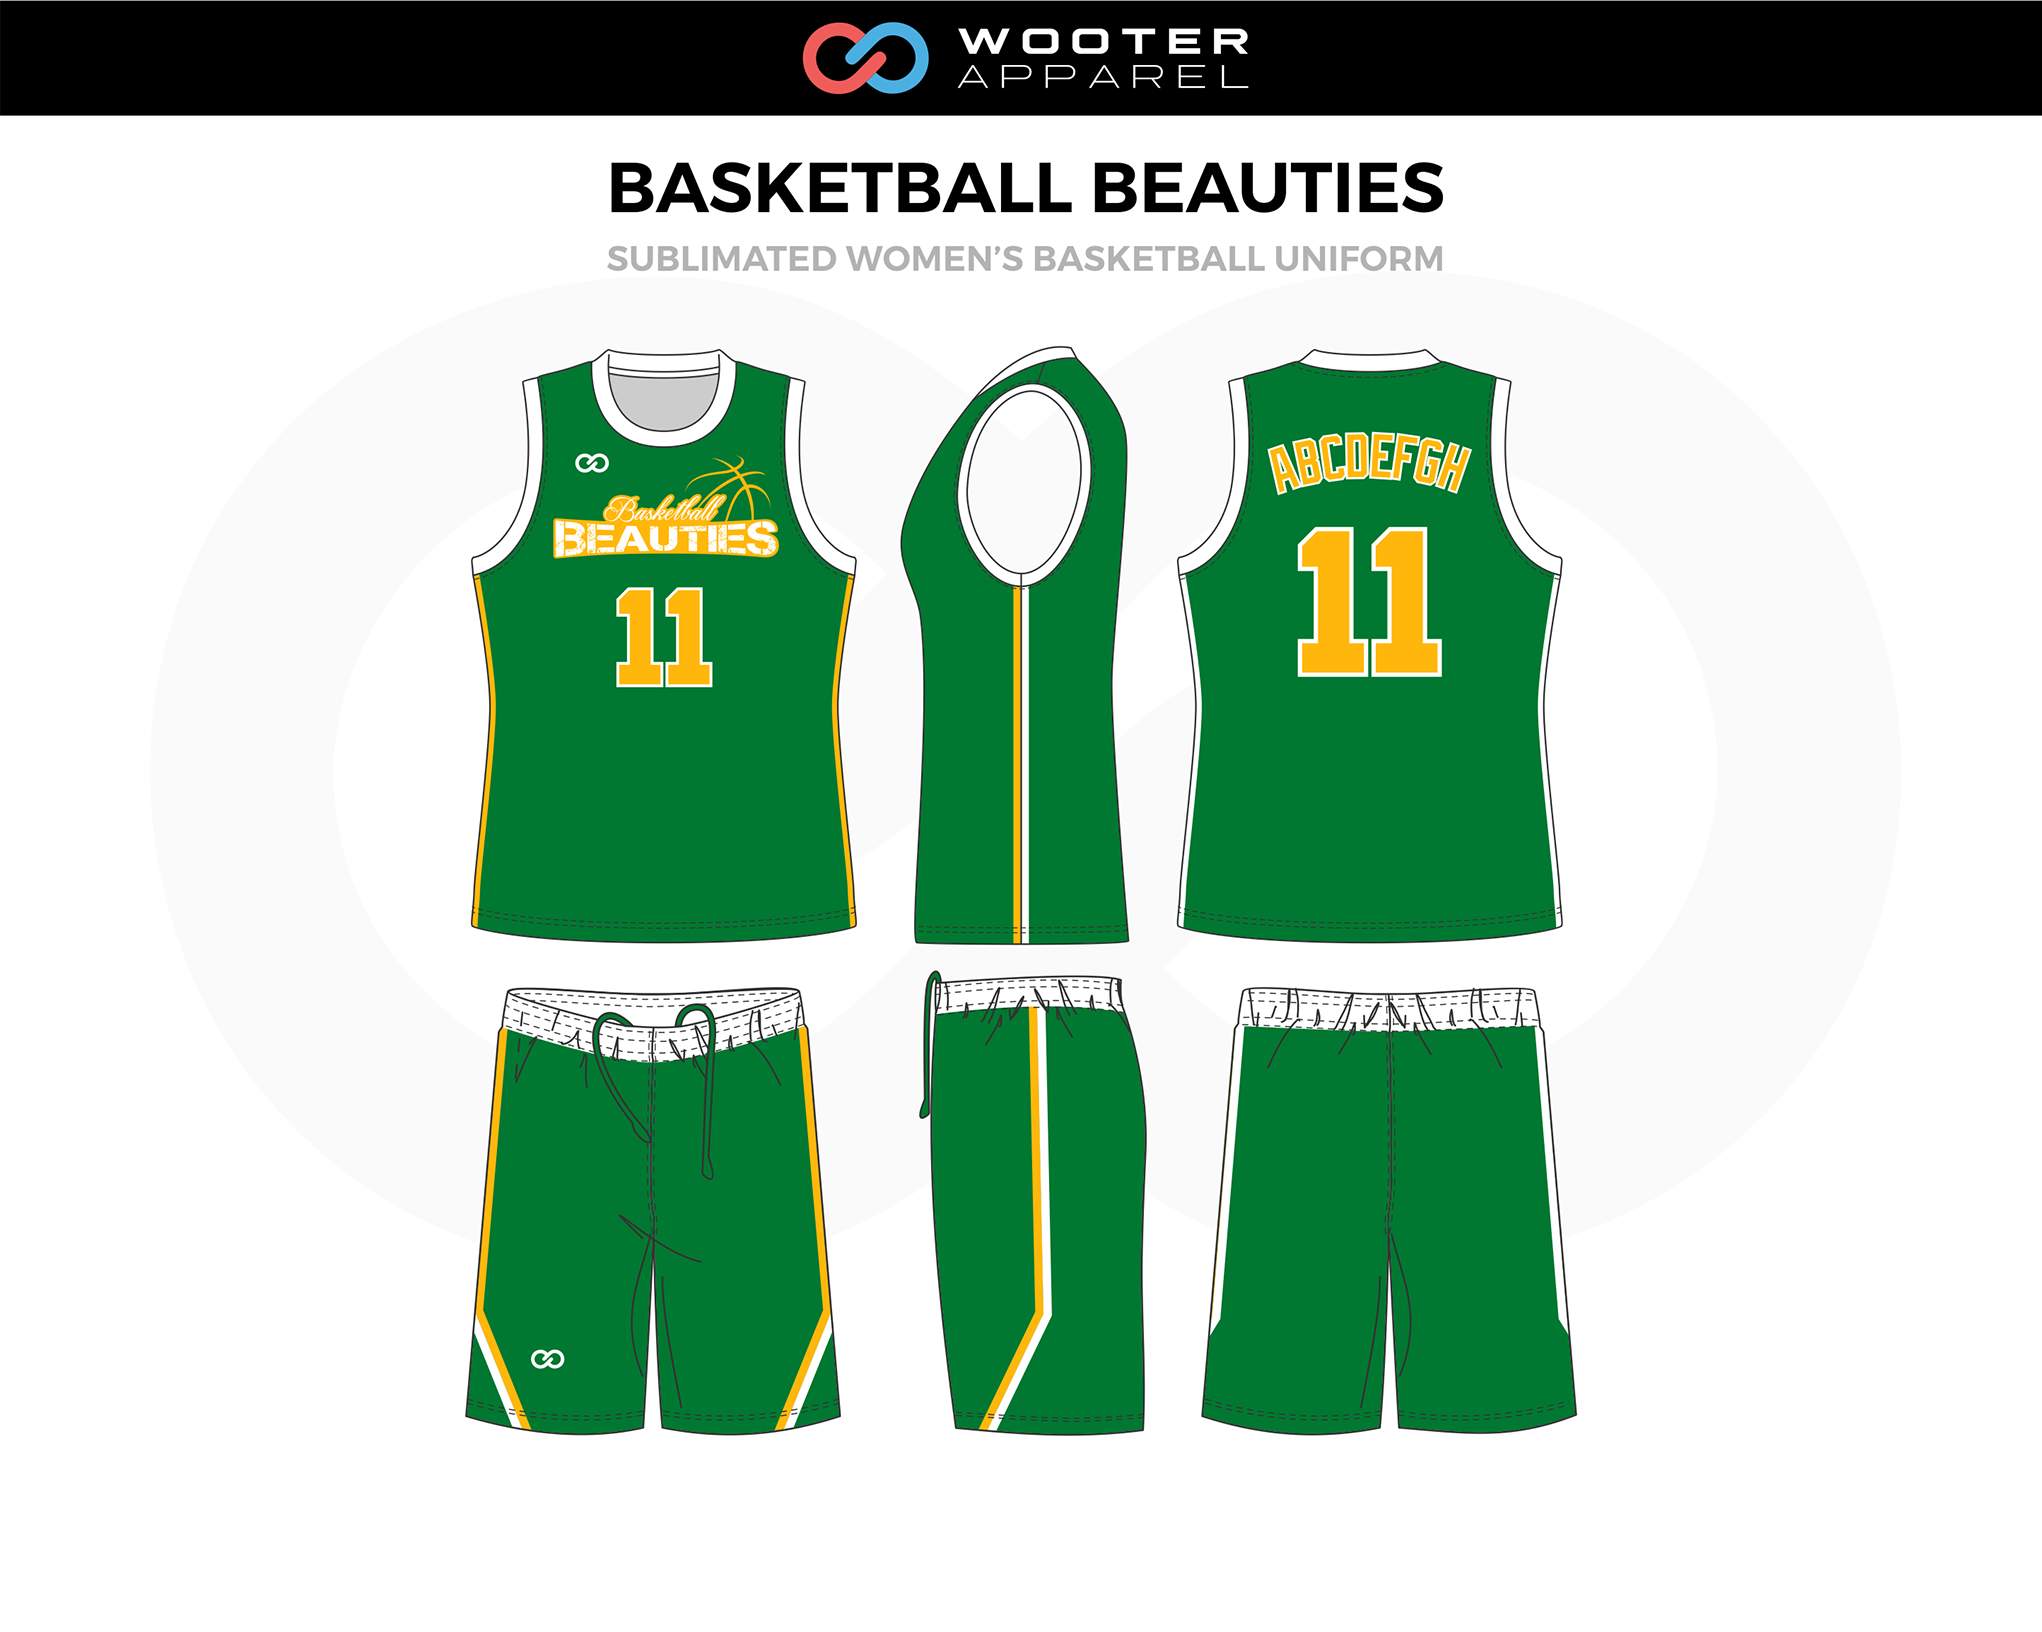 the latest 22db3 aee30 Basketball Uniform Designs — Wooter Apparel | Team Uniforms ...